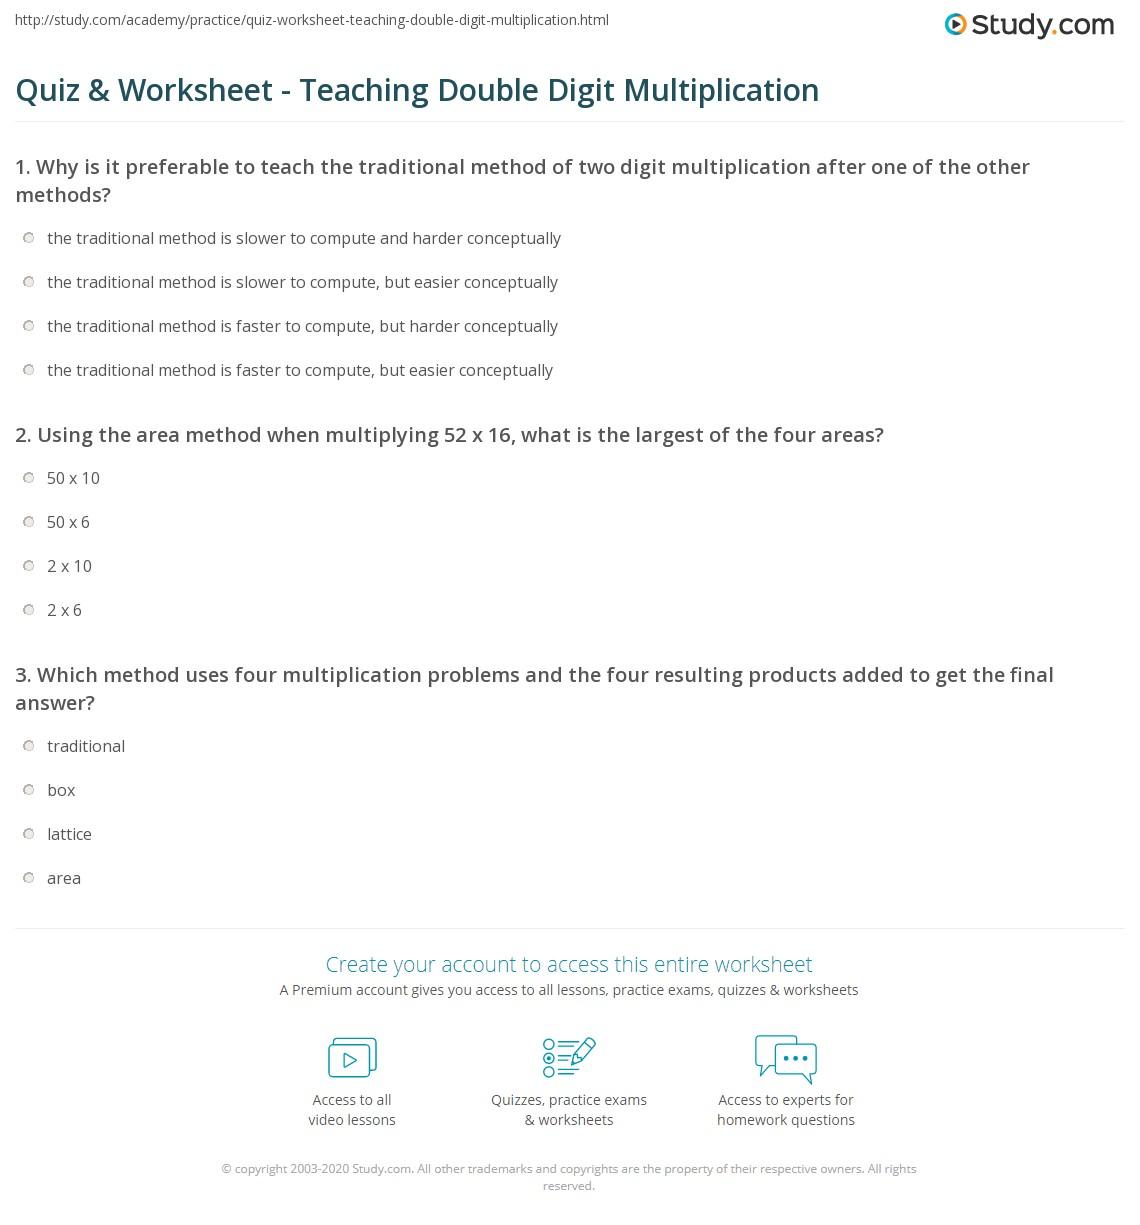 Quiz & Worksheet - Teaching Double Digit Multiplication | Study.com